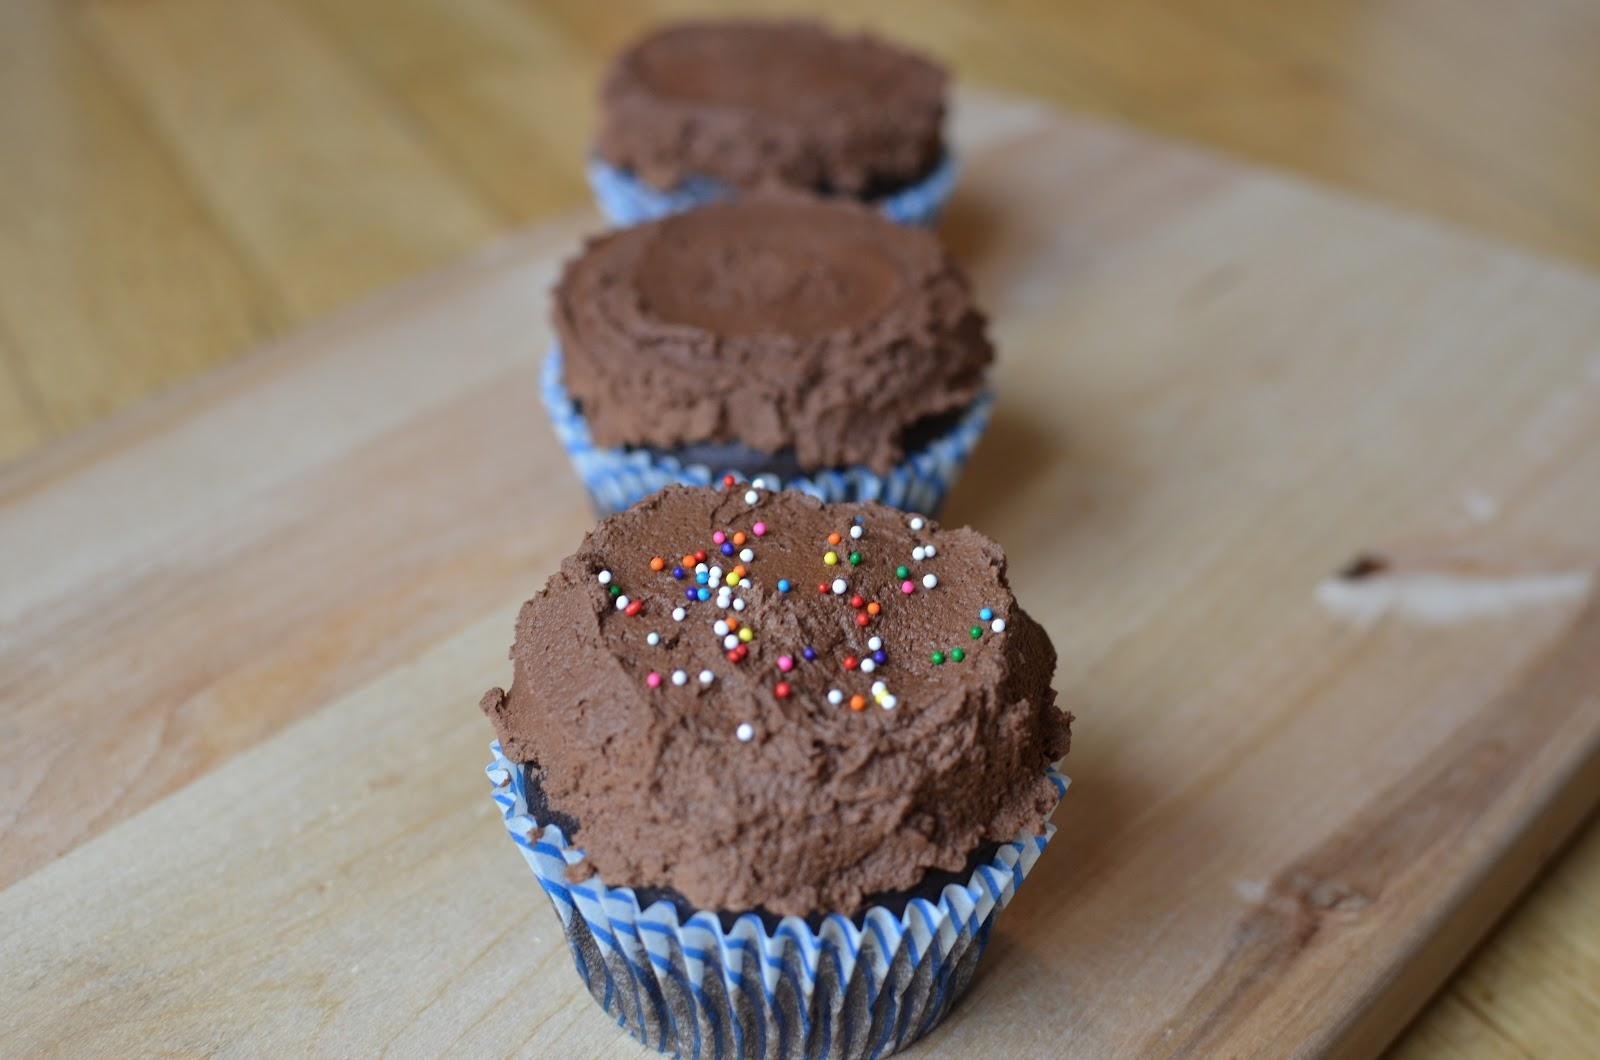 Best Vegan Cupcakes And Cakes In San Antonio Boerne